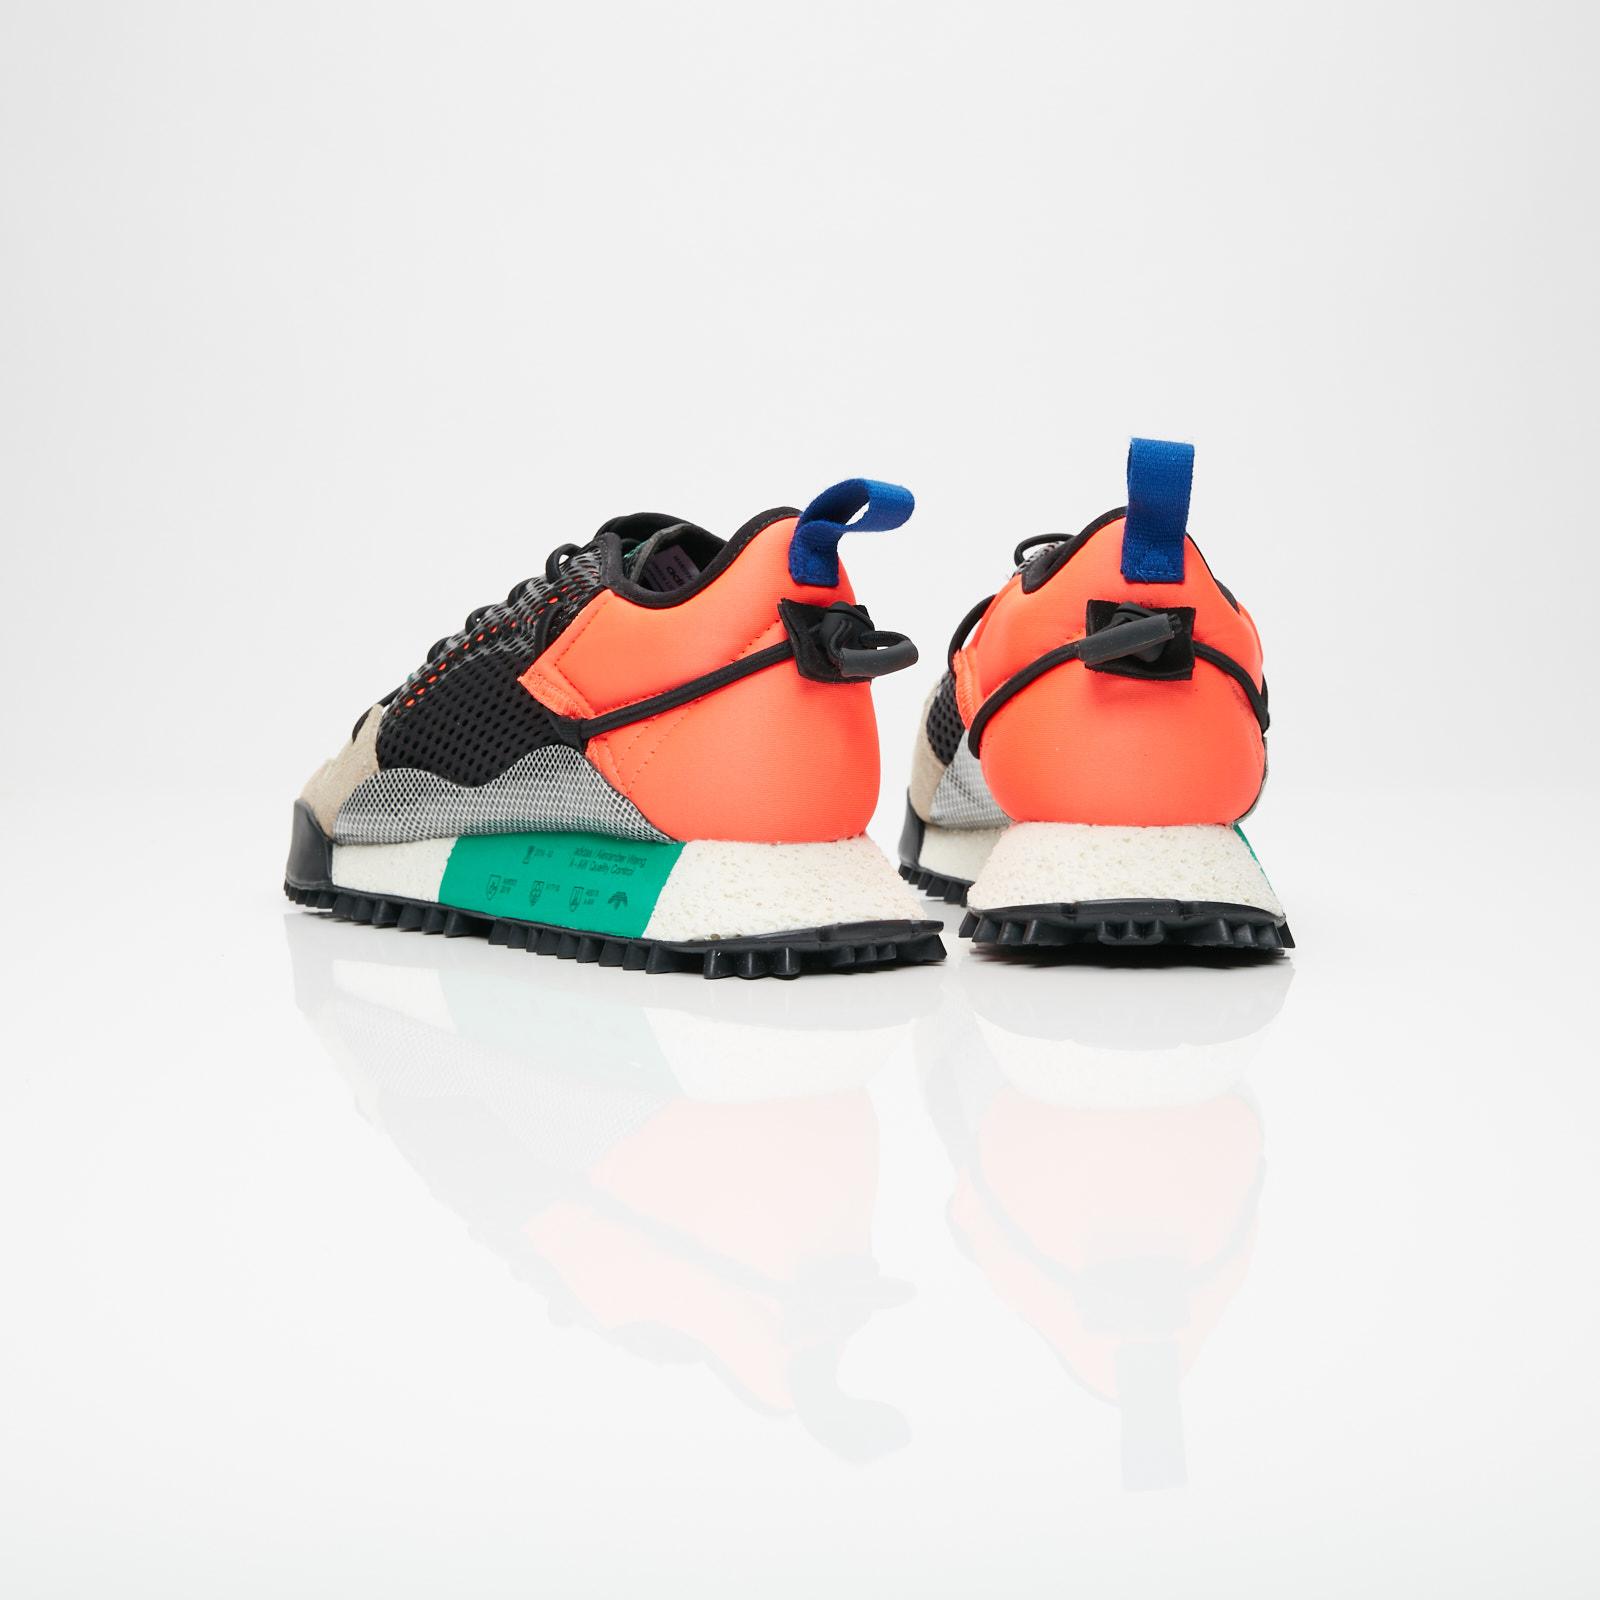 adidas Reissue Run x Alexander Wang Aq1233